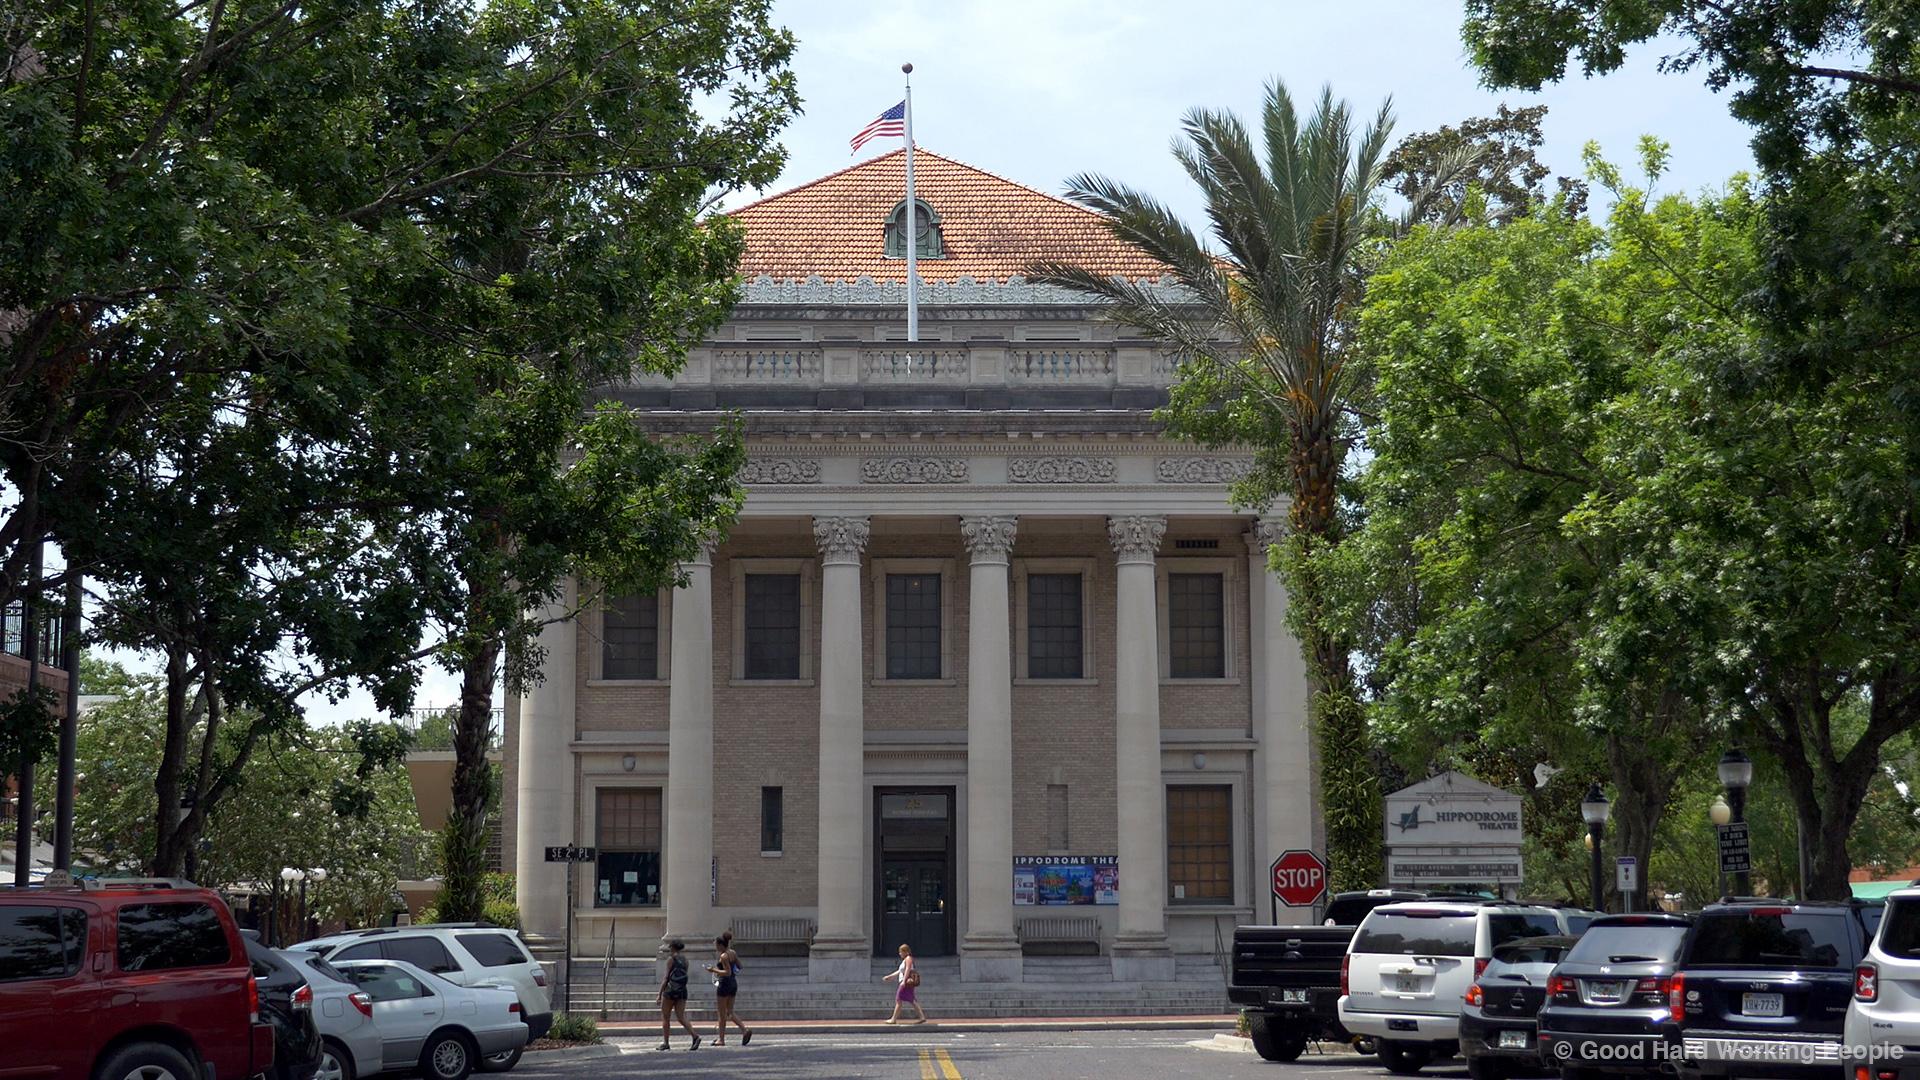 Hippodrome Theatre, Gainesville, Florida